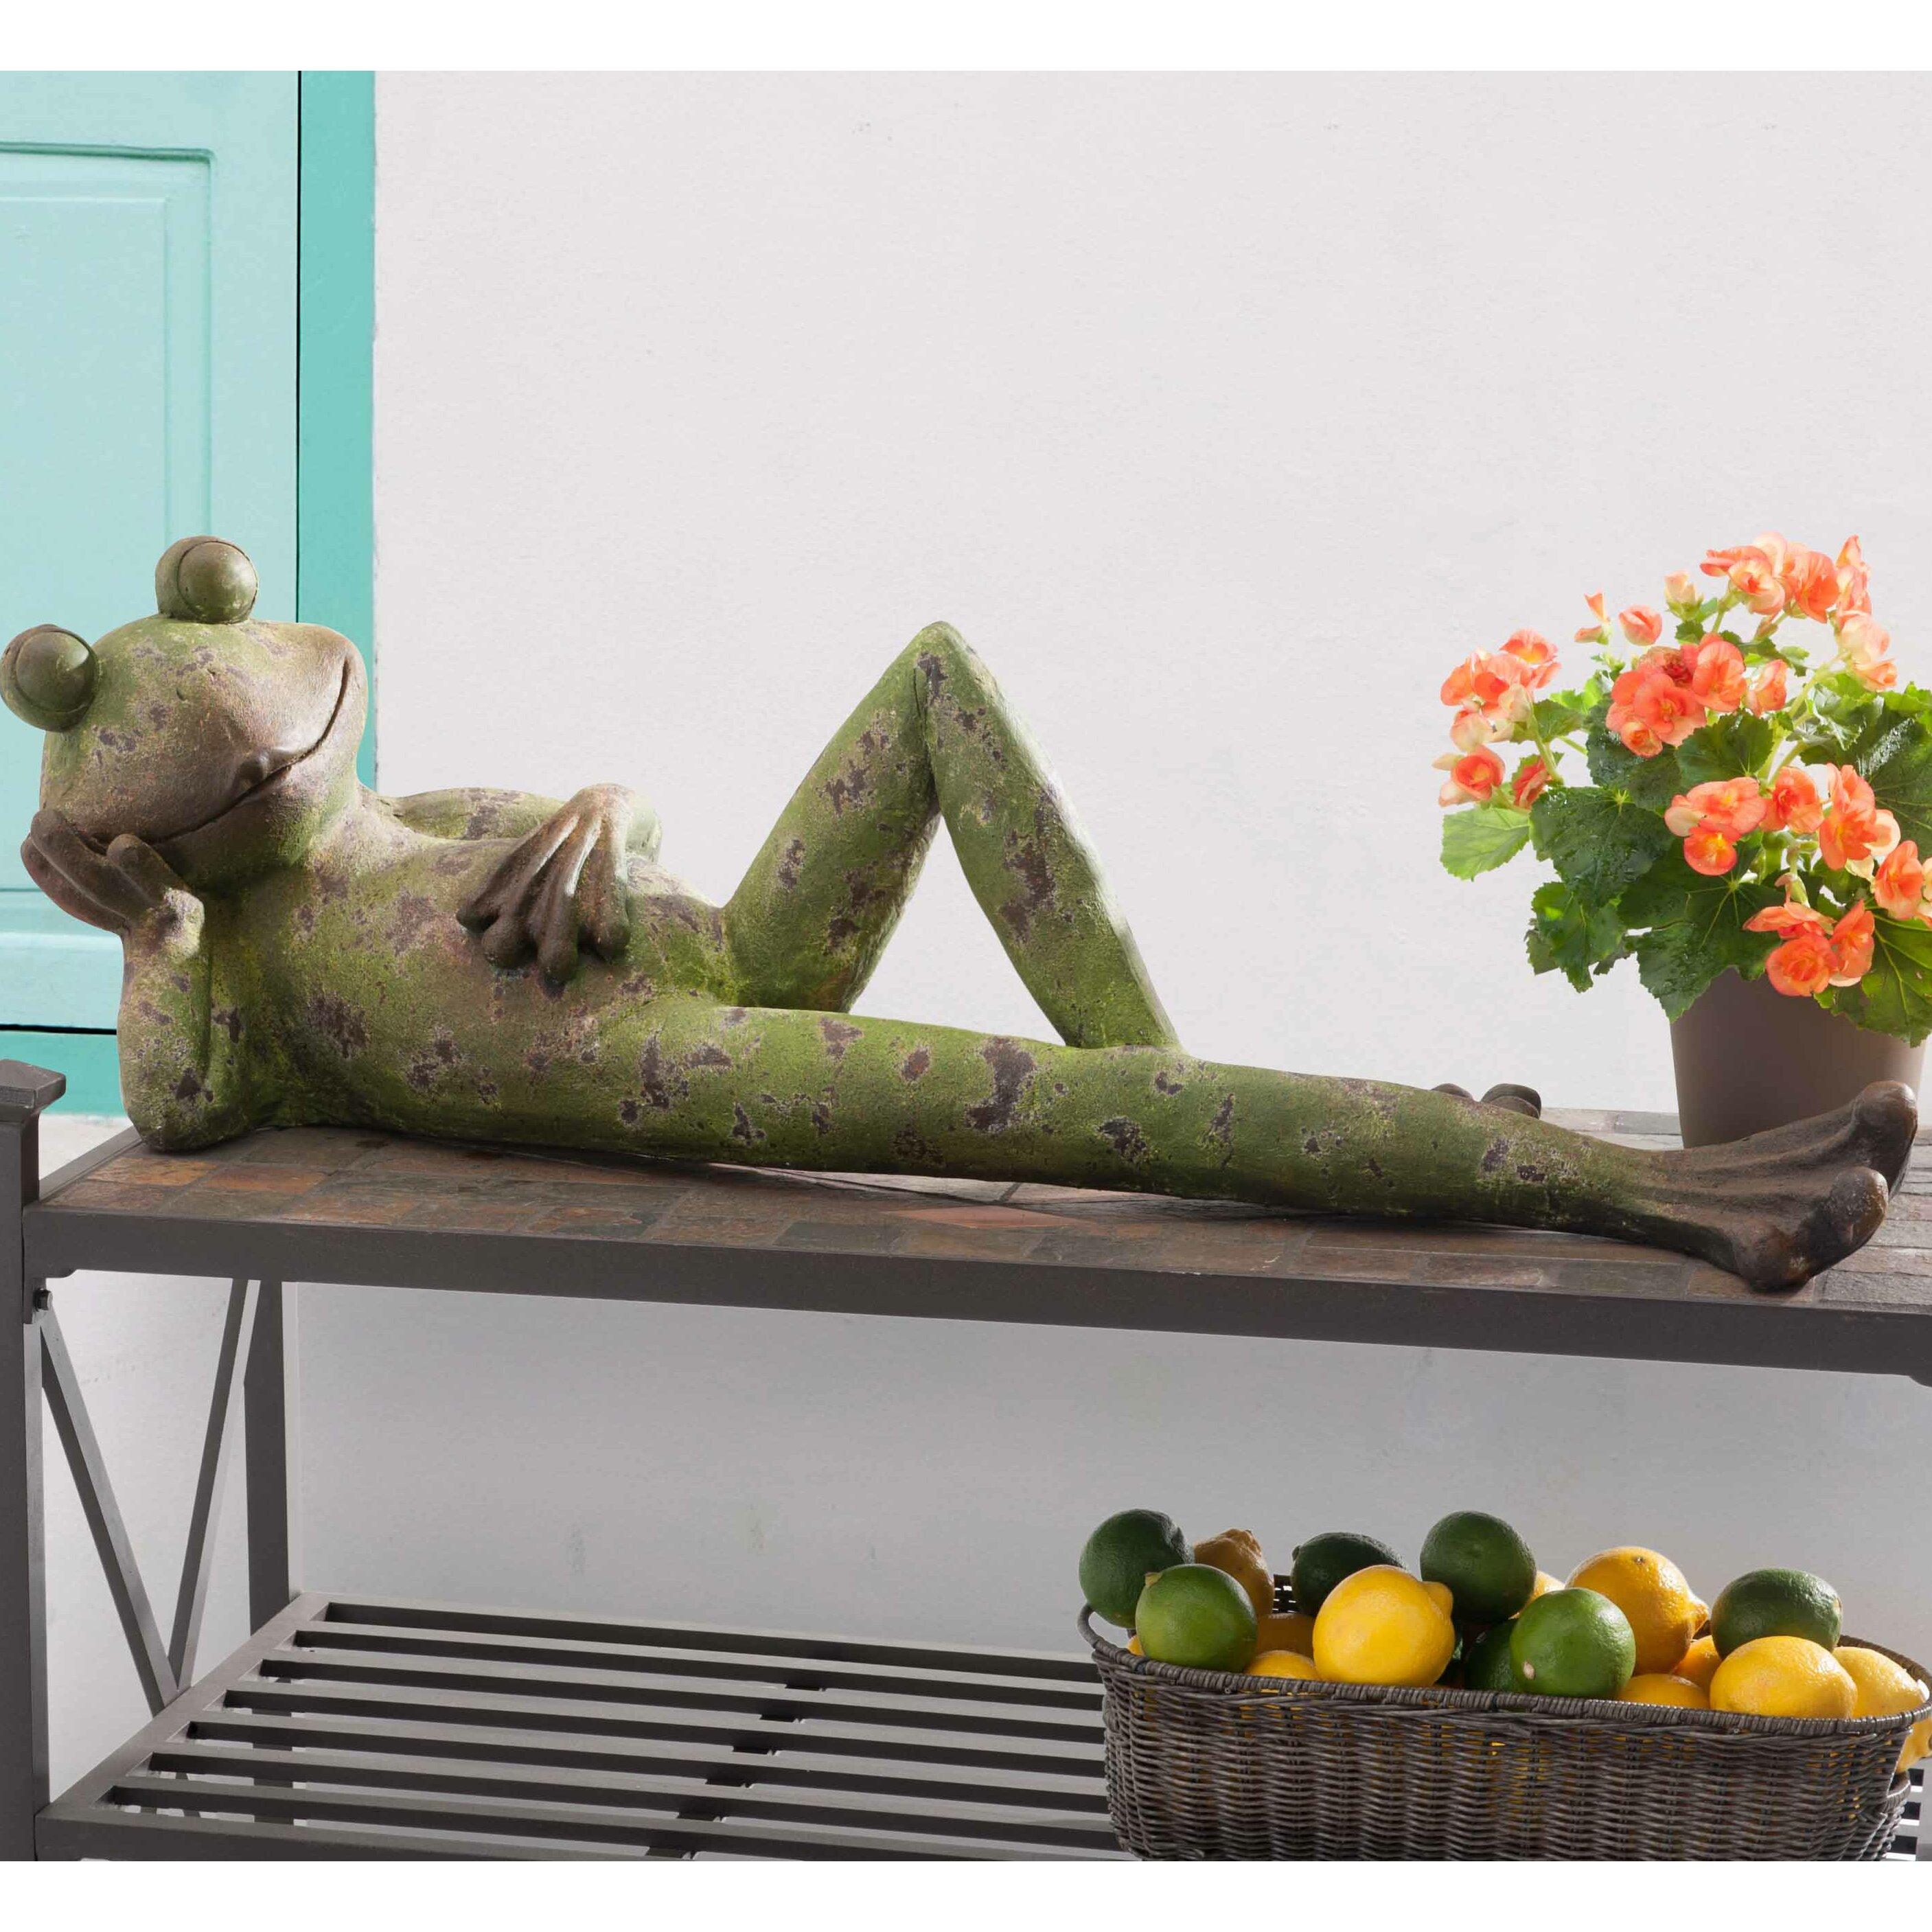 Wayfair Garden Statues: Sunjoy Laid Back Frog Garden Statue